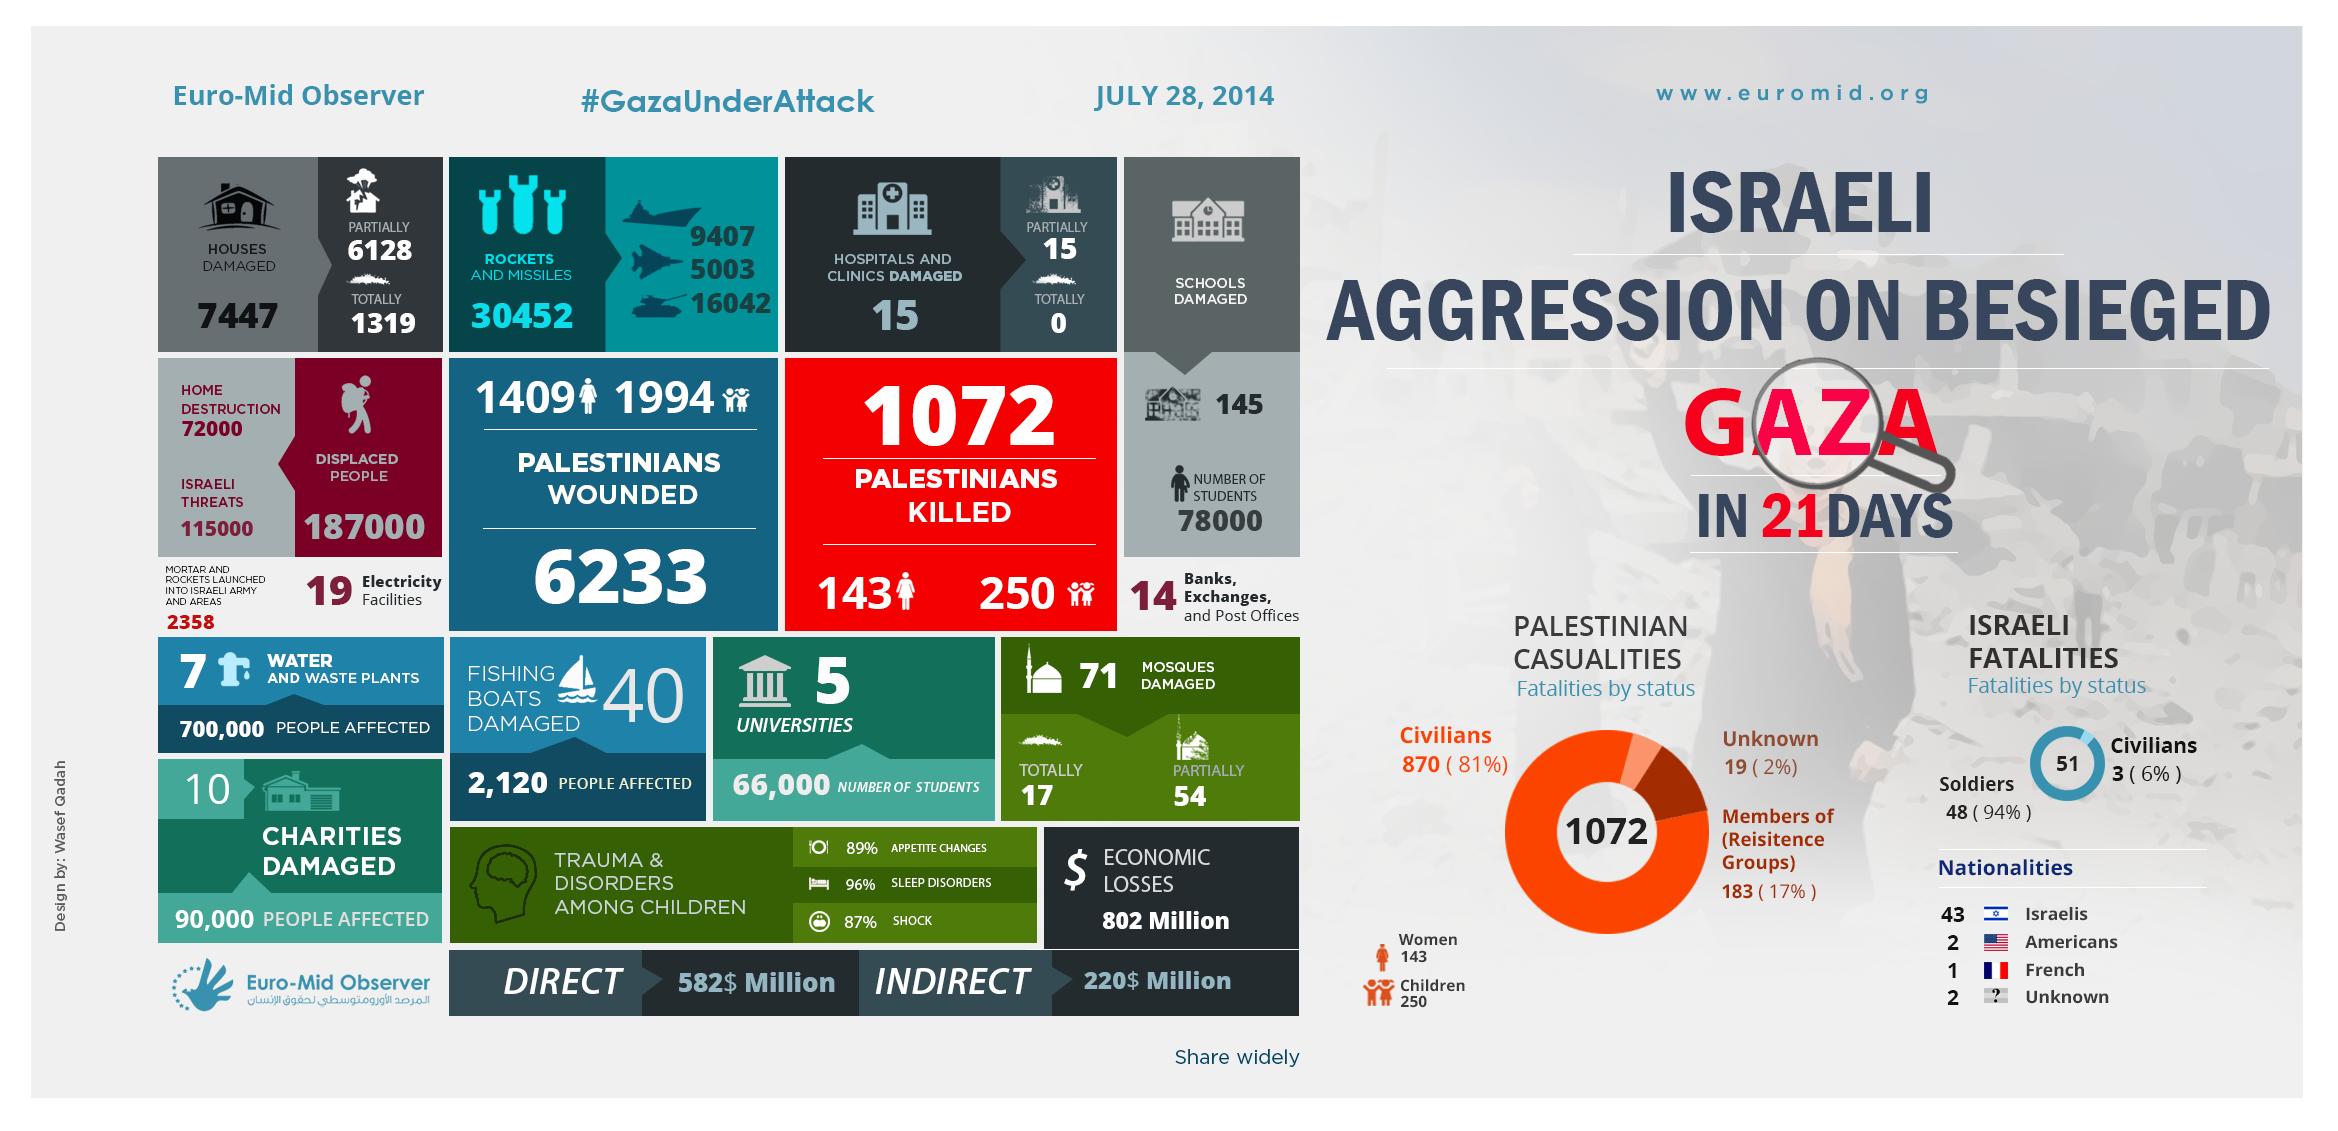 Israeli Aggression on besieged Gaza in 21 Days